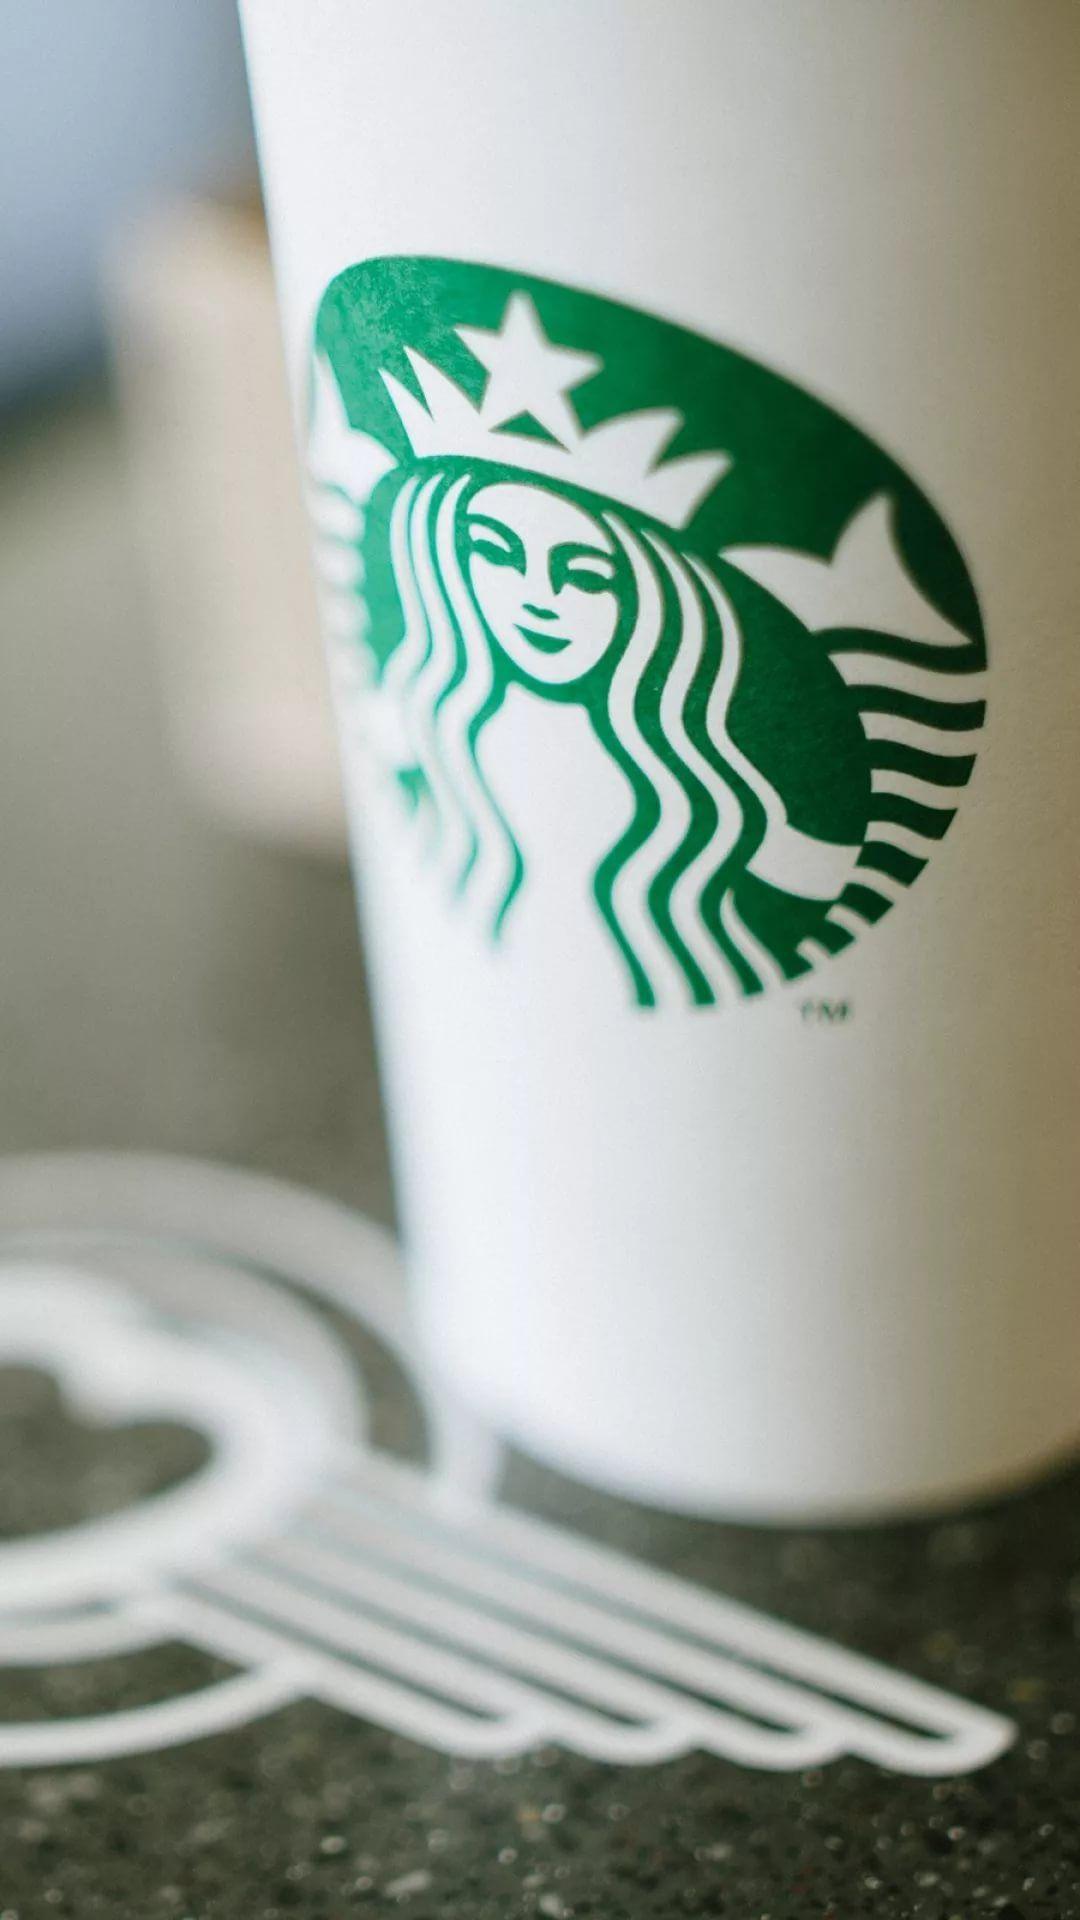 Starbucks HD iPhone 7 wallpapers